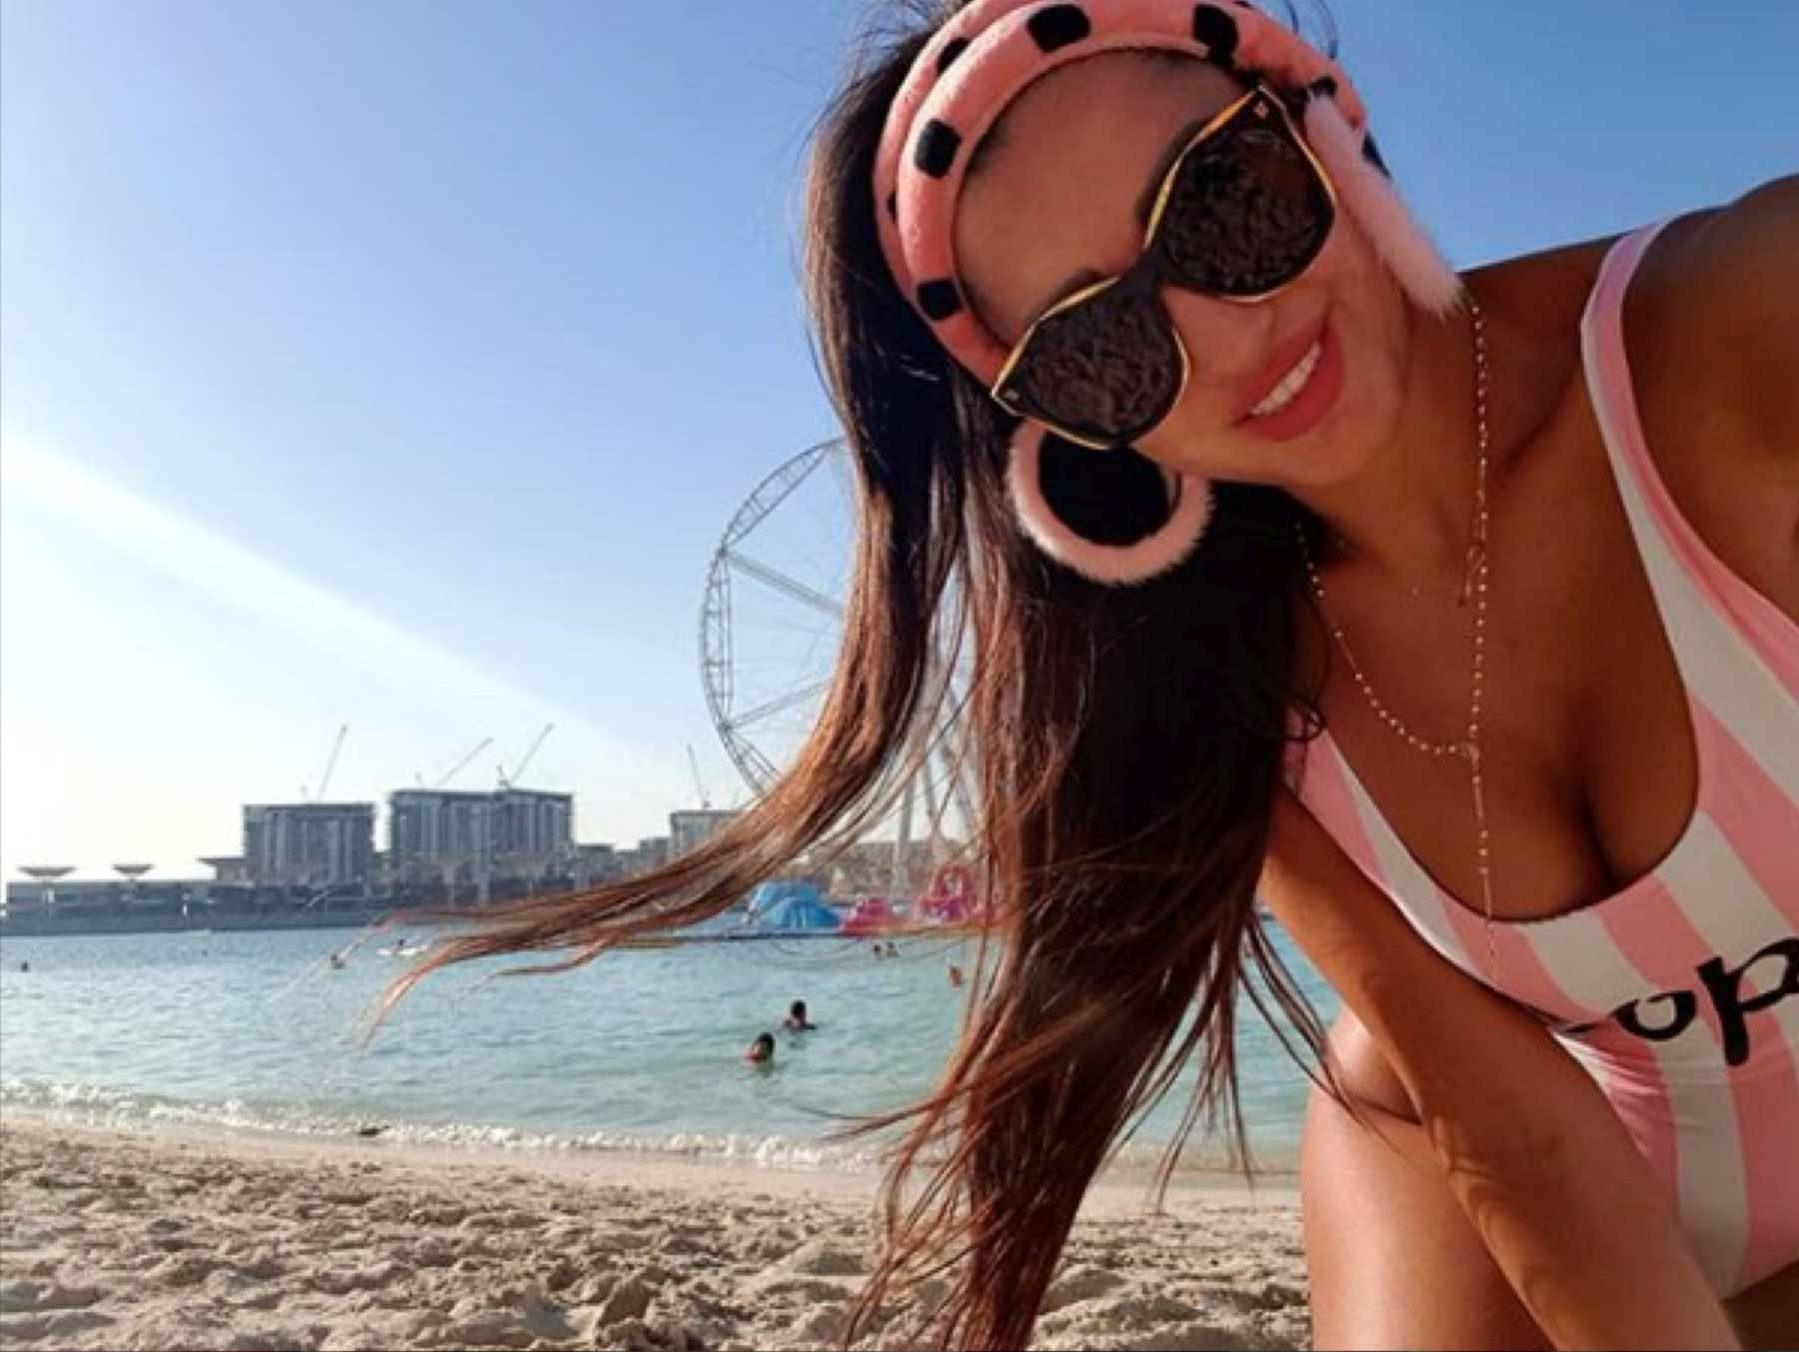 @carol.atieh's cover photo for 'My Fabulous Visit to the Westin Hotel Dubai - Carole Atieh'